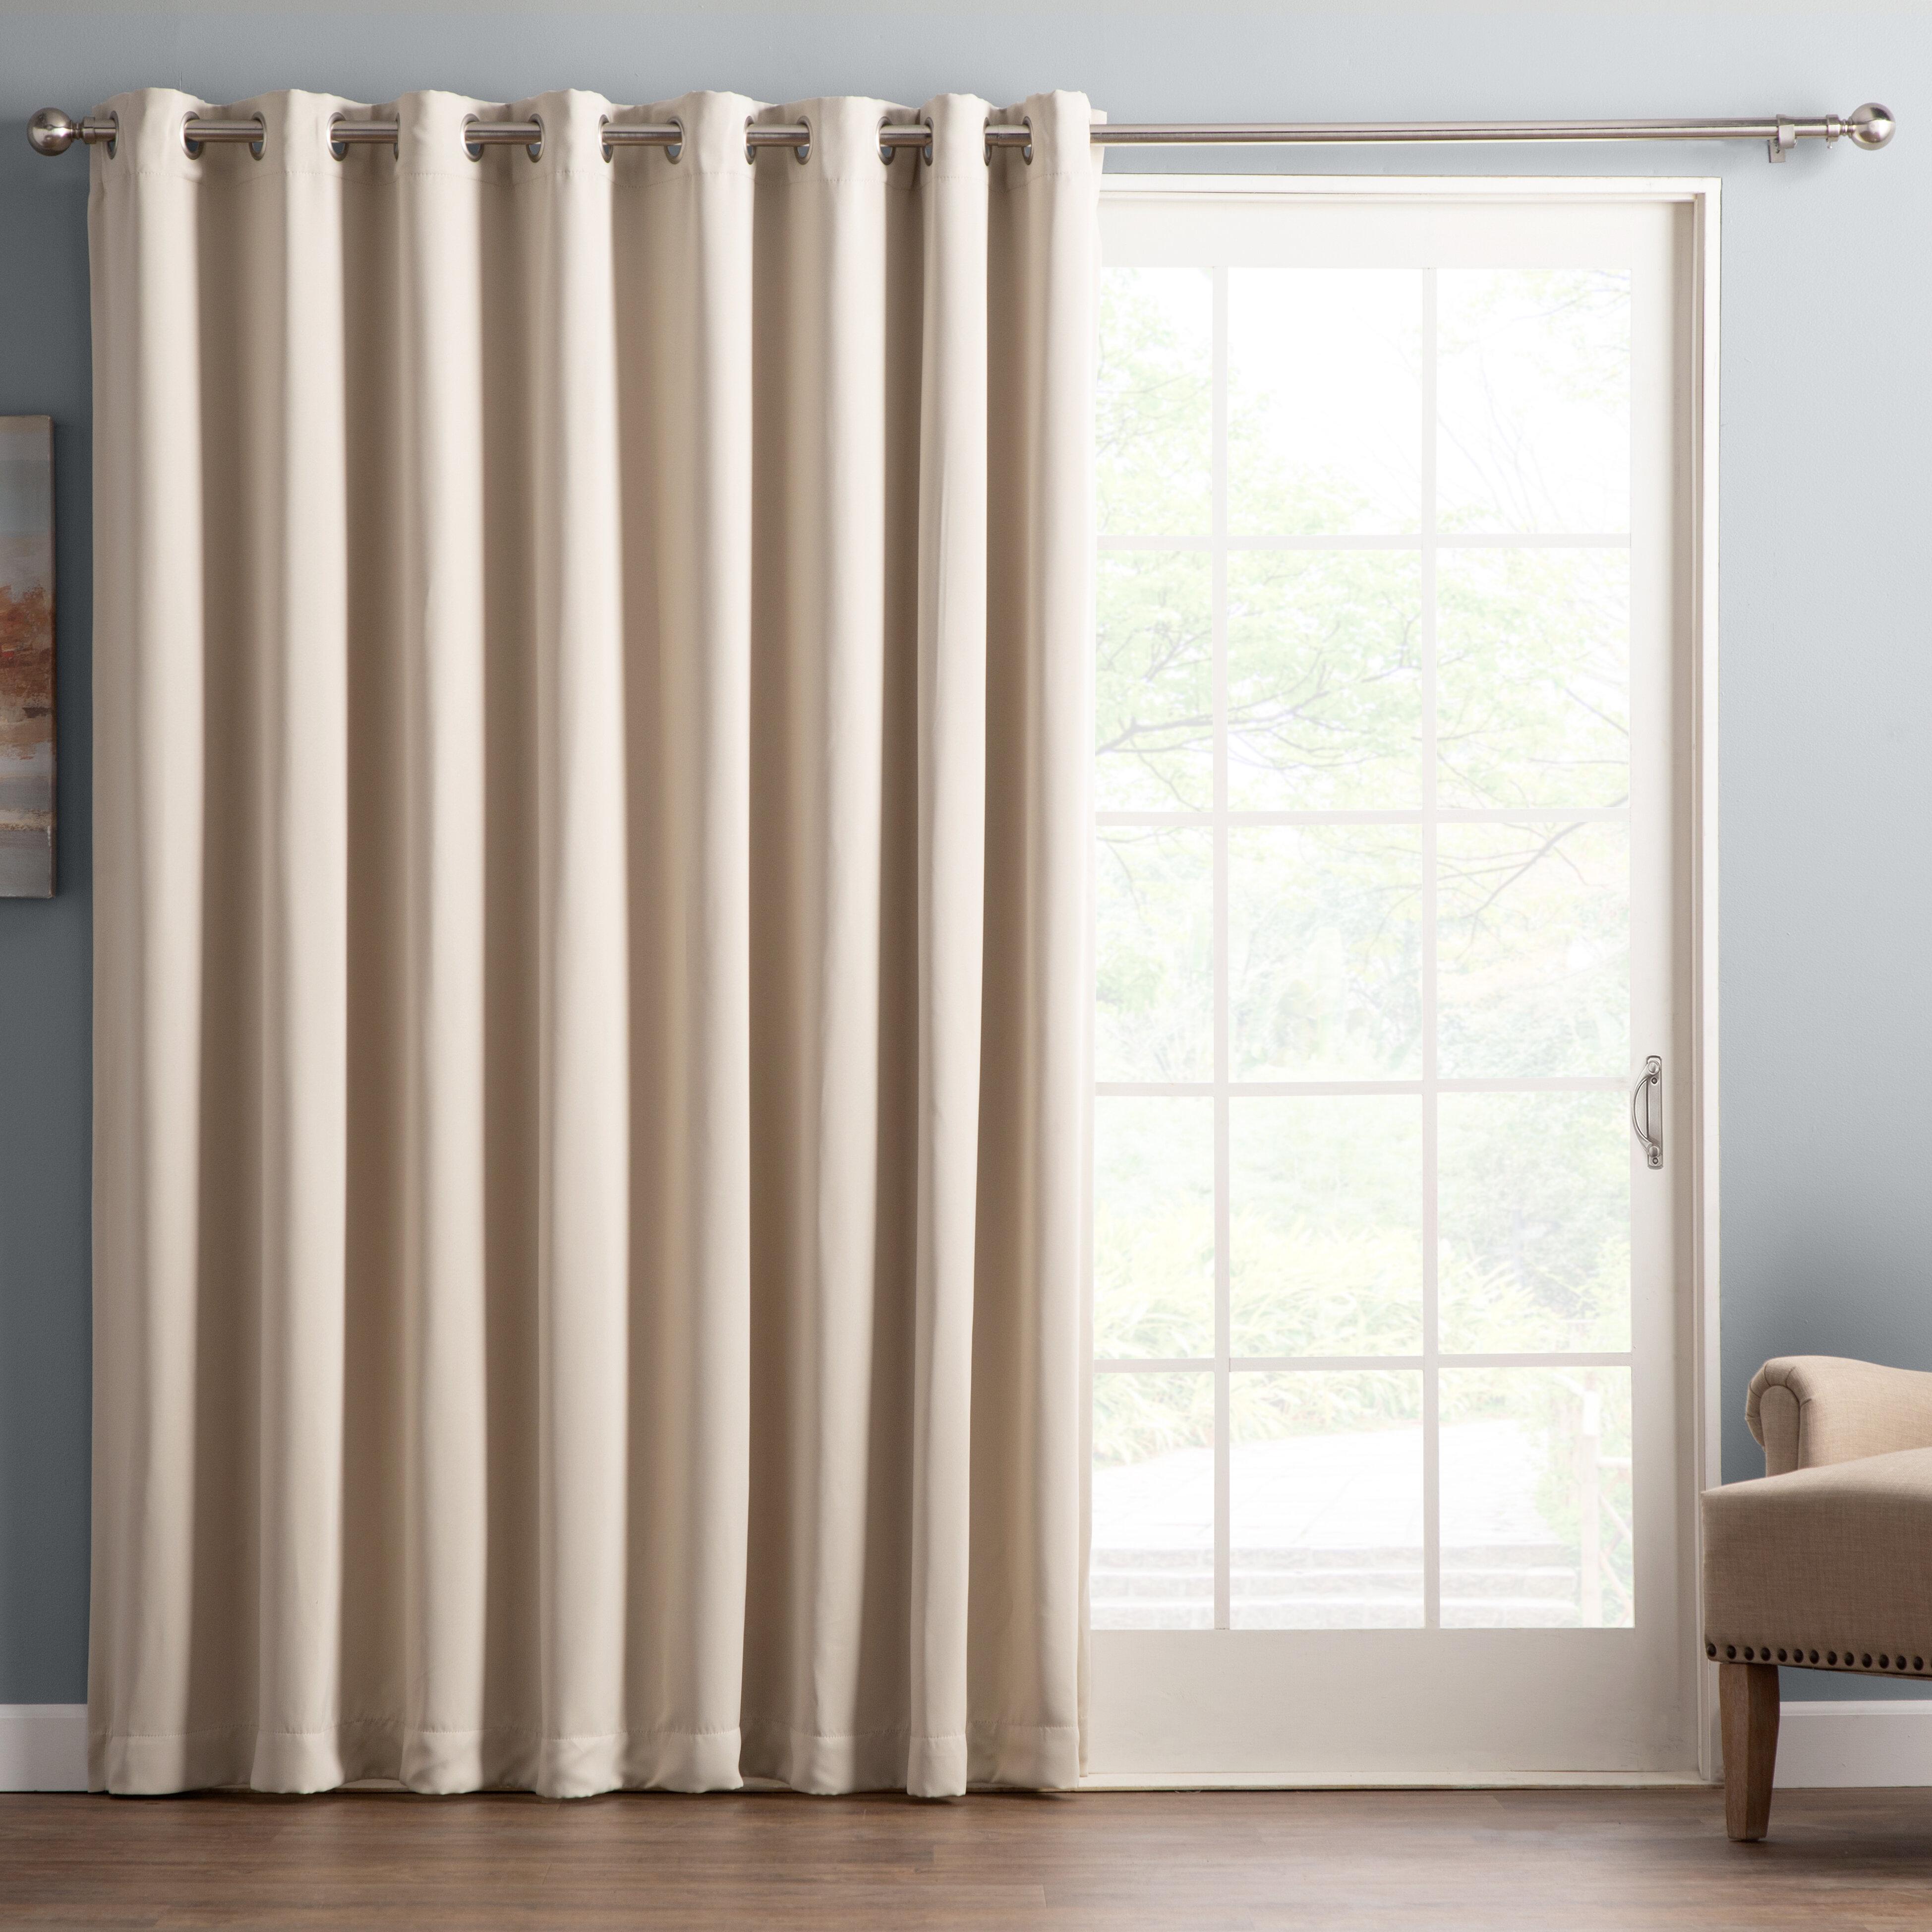 Wayfair Basics Solid Blackout Thermal Grommet Single Curtain Panel